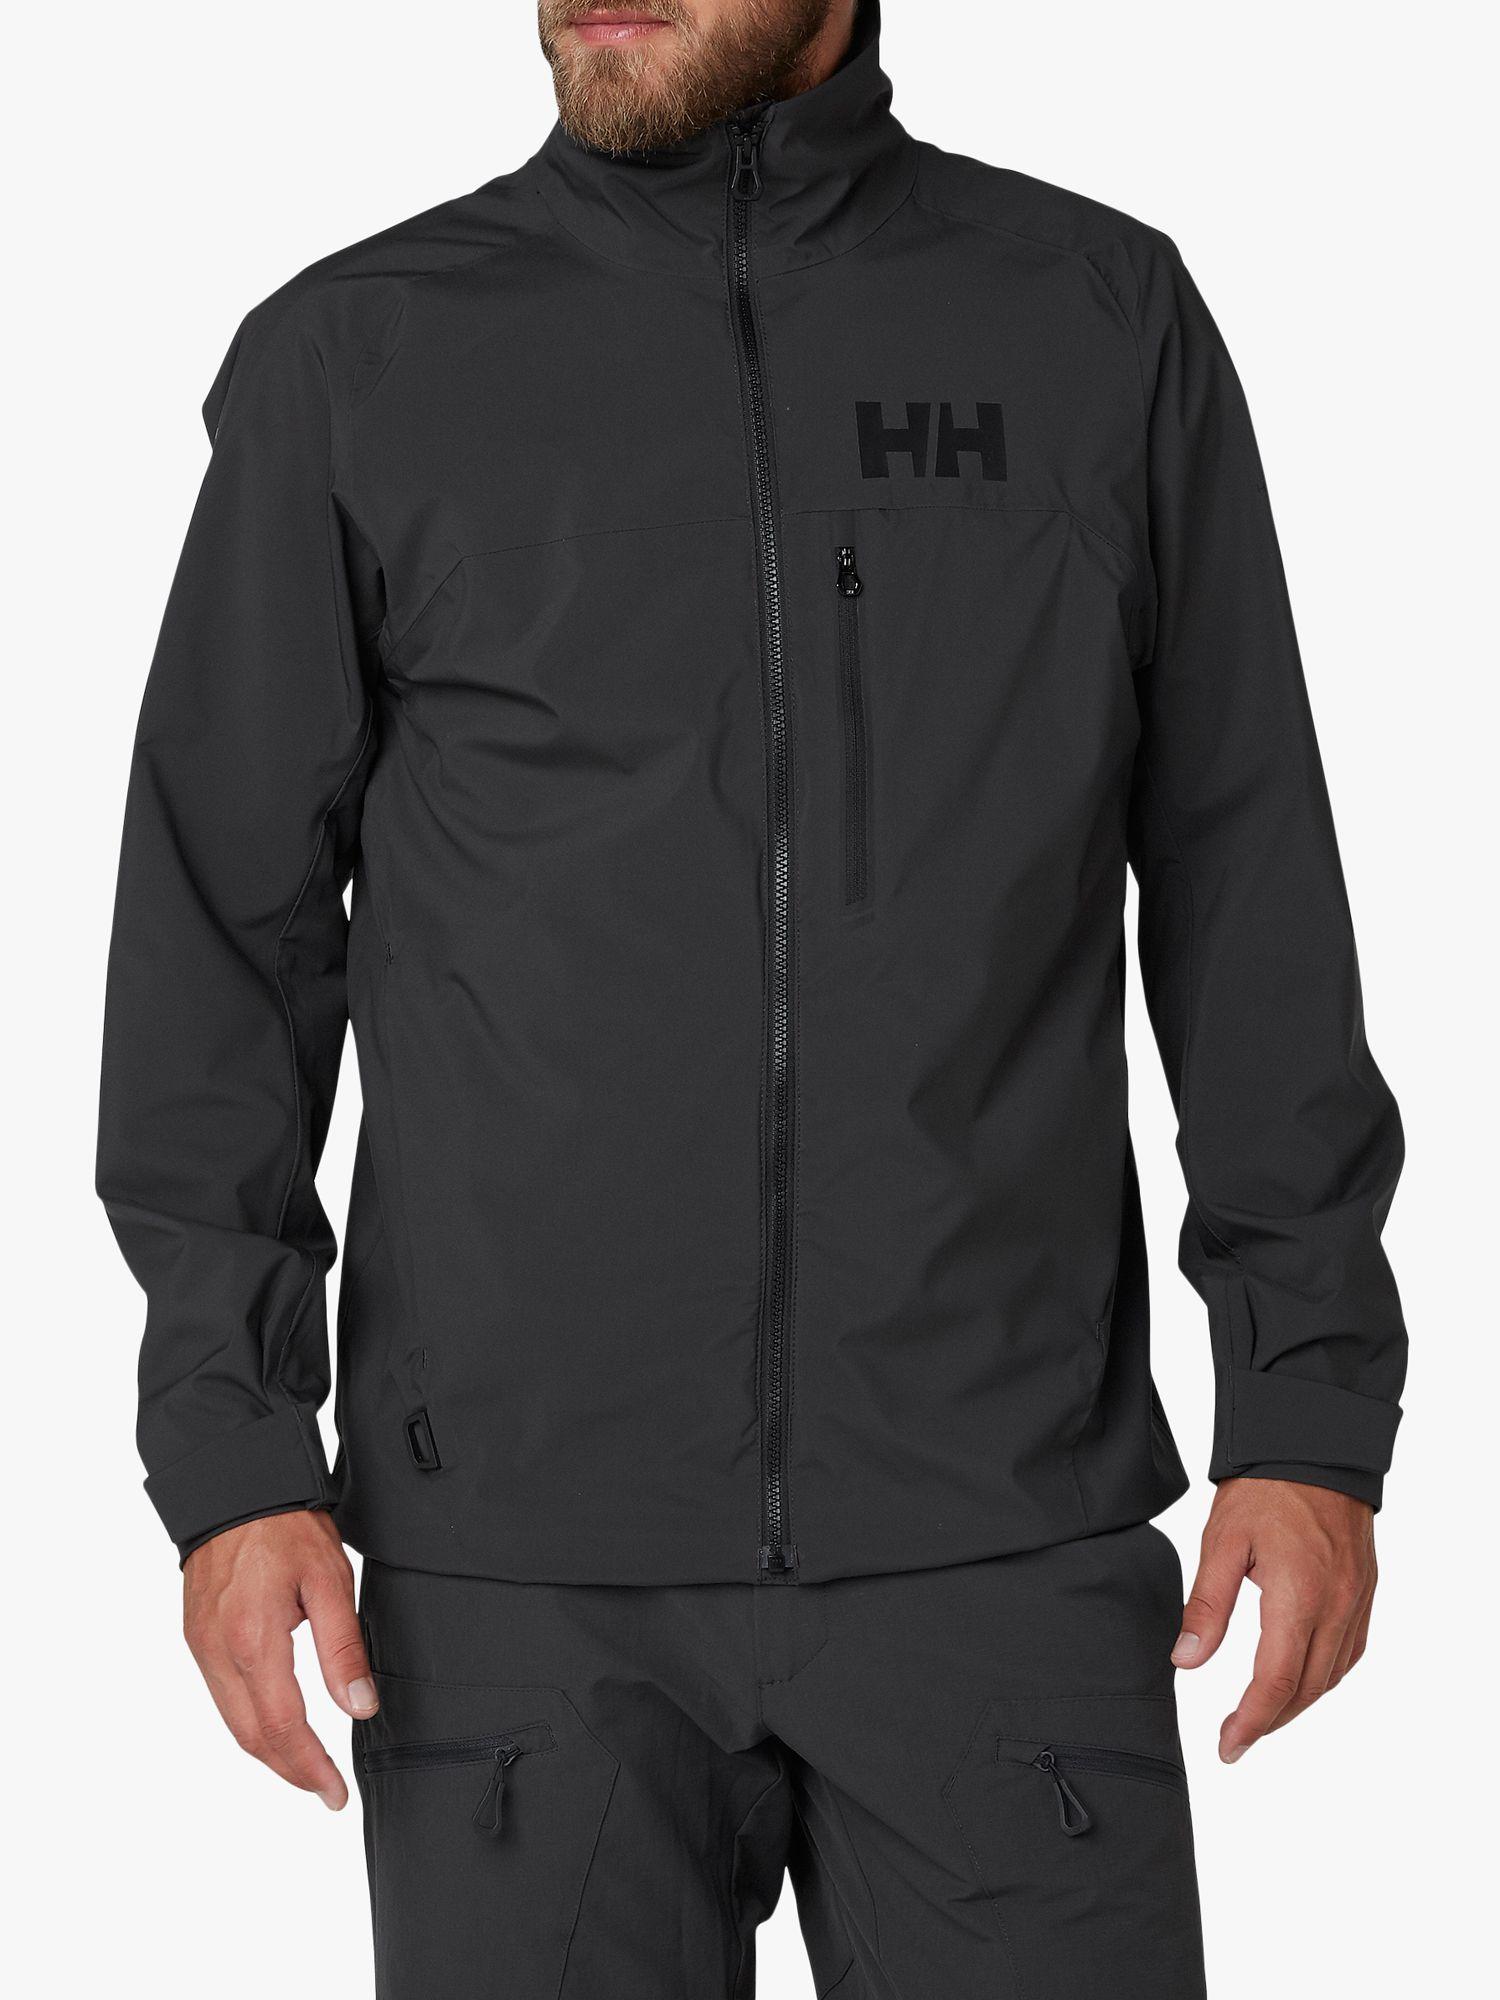 Helly Hansen Helly Hansen HP Racing Men's Waterproof Jacket, Ebony